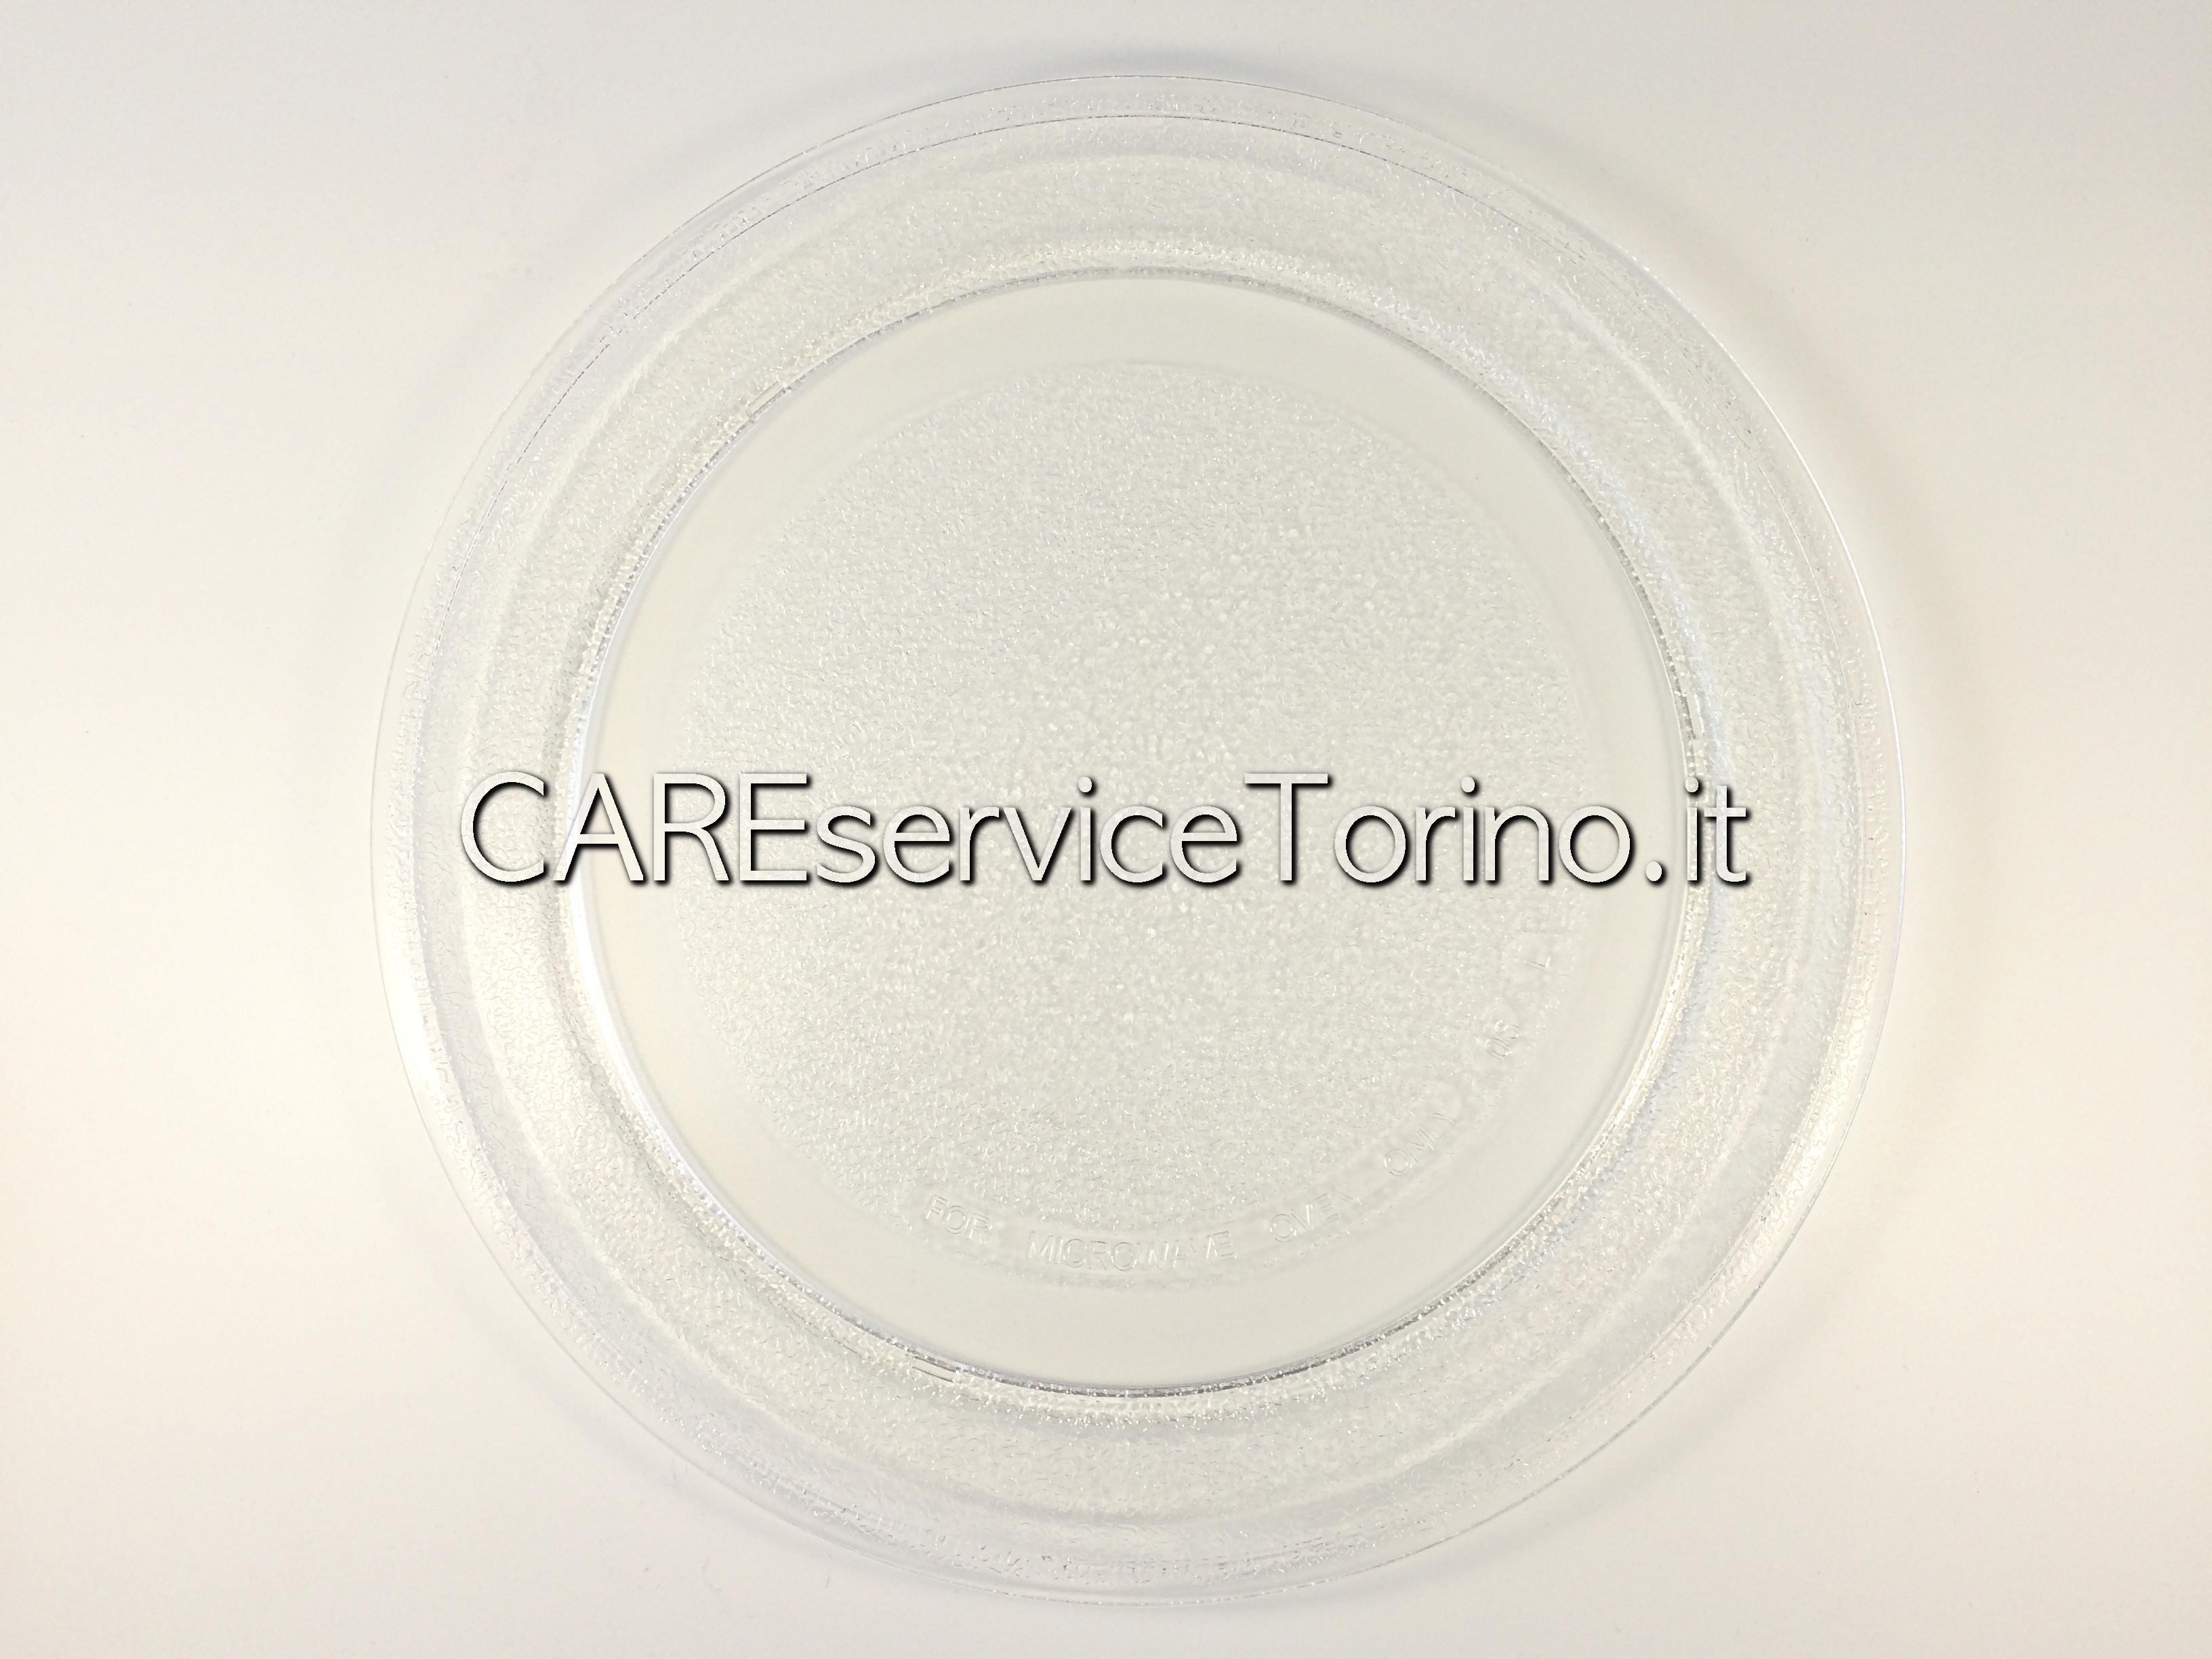 Cs, CAREservice 3390W1A035A-1 MICROONDE | Piatto [Cod.3390W1A035A] DeLonghi LG Microonde Piatti Vetro  3390W1A035A